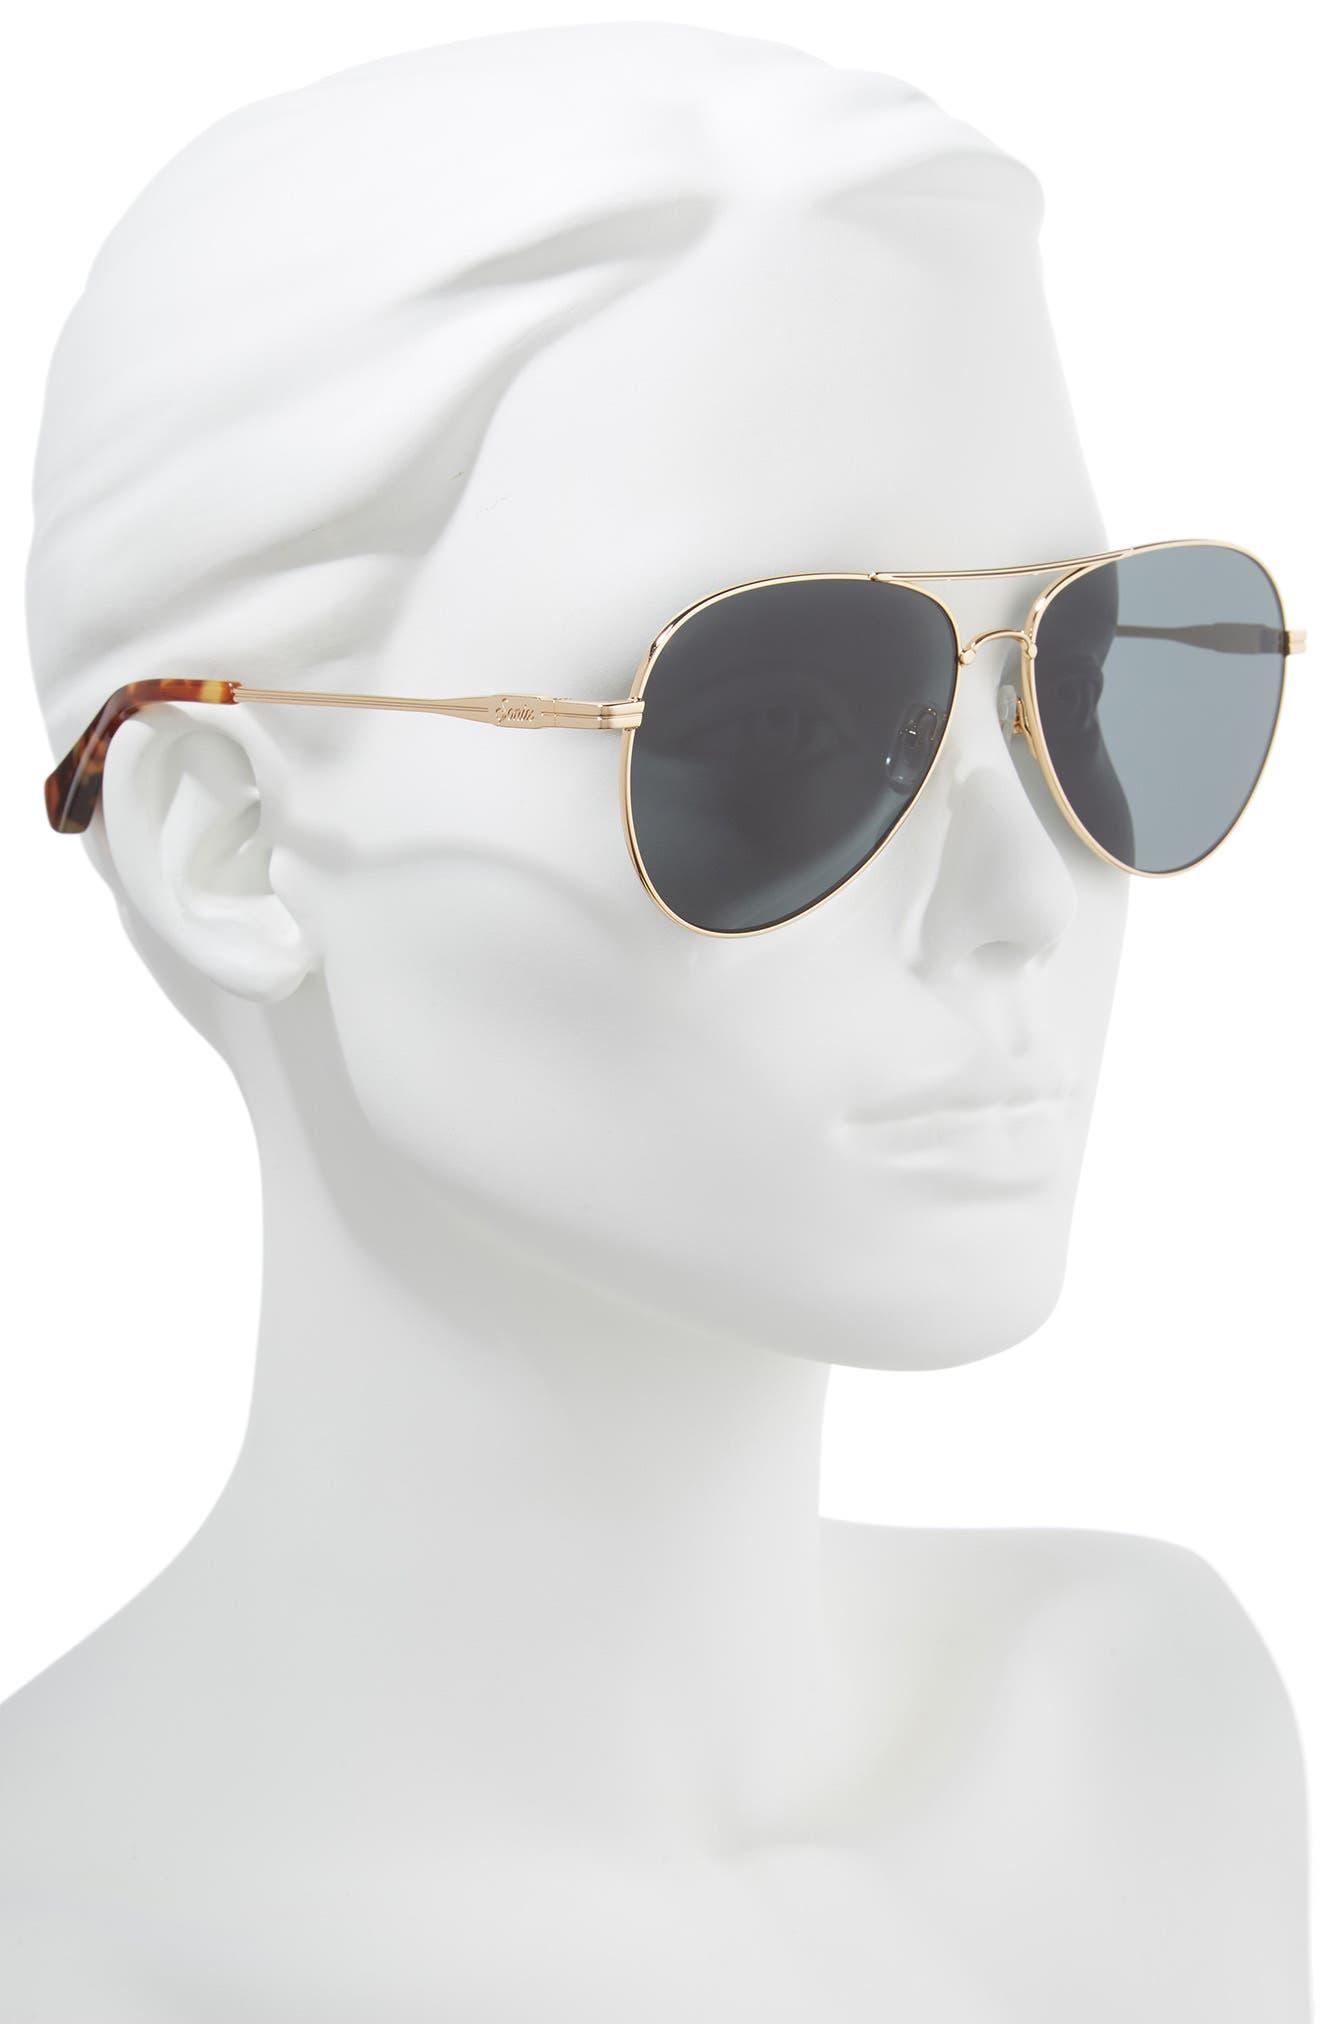 Lodi 61mm Mirrored Aviator Sunglasses,                             Alternate thumbnail 2, color,                             Gold Wire/ Black Solid